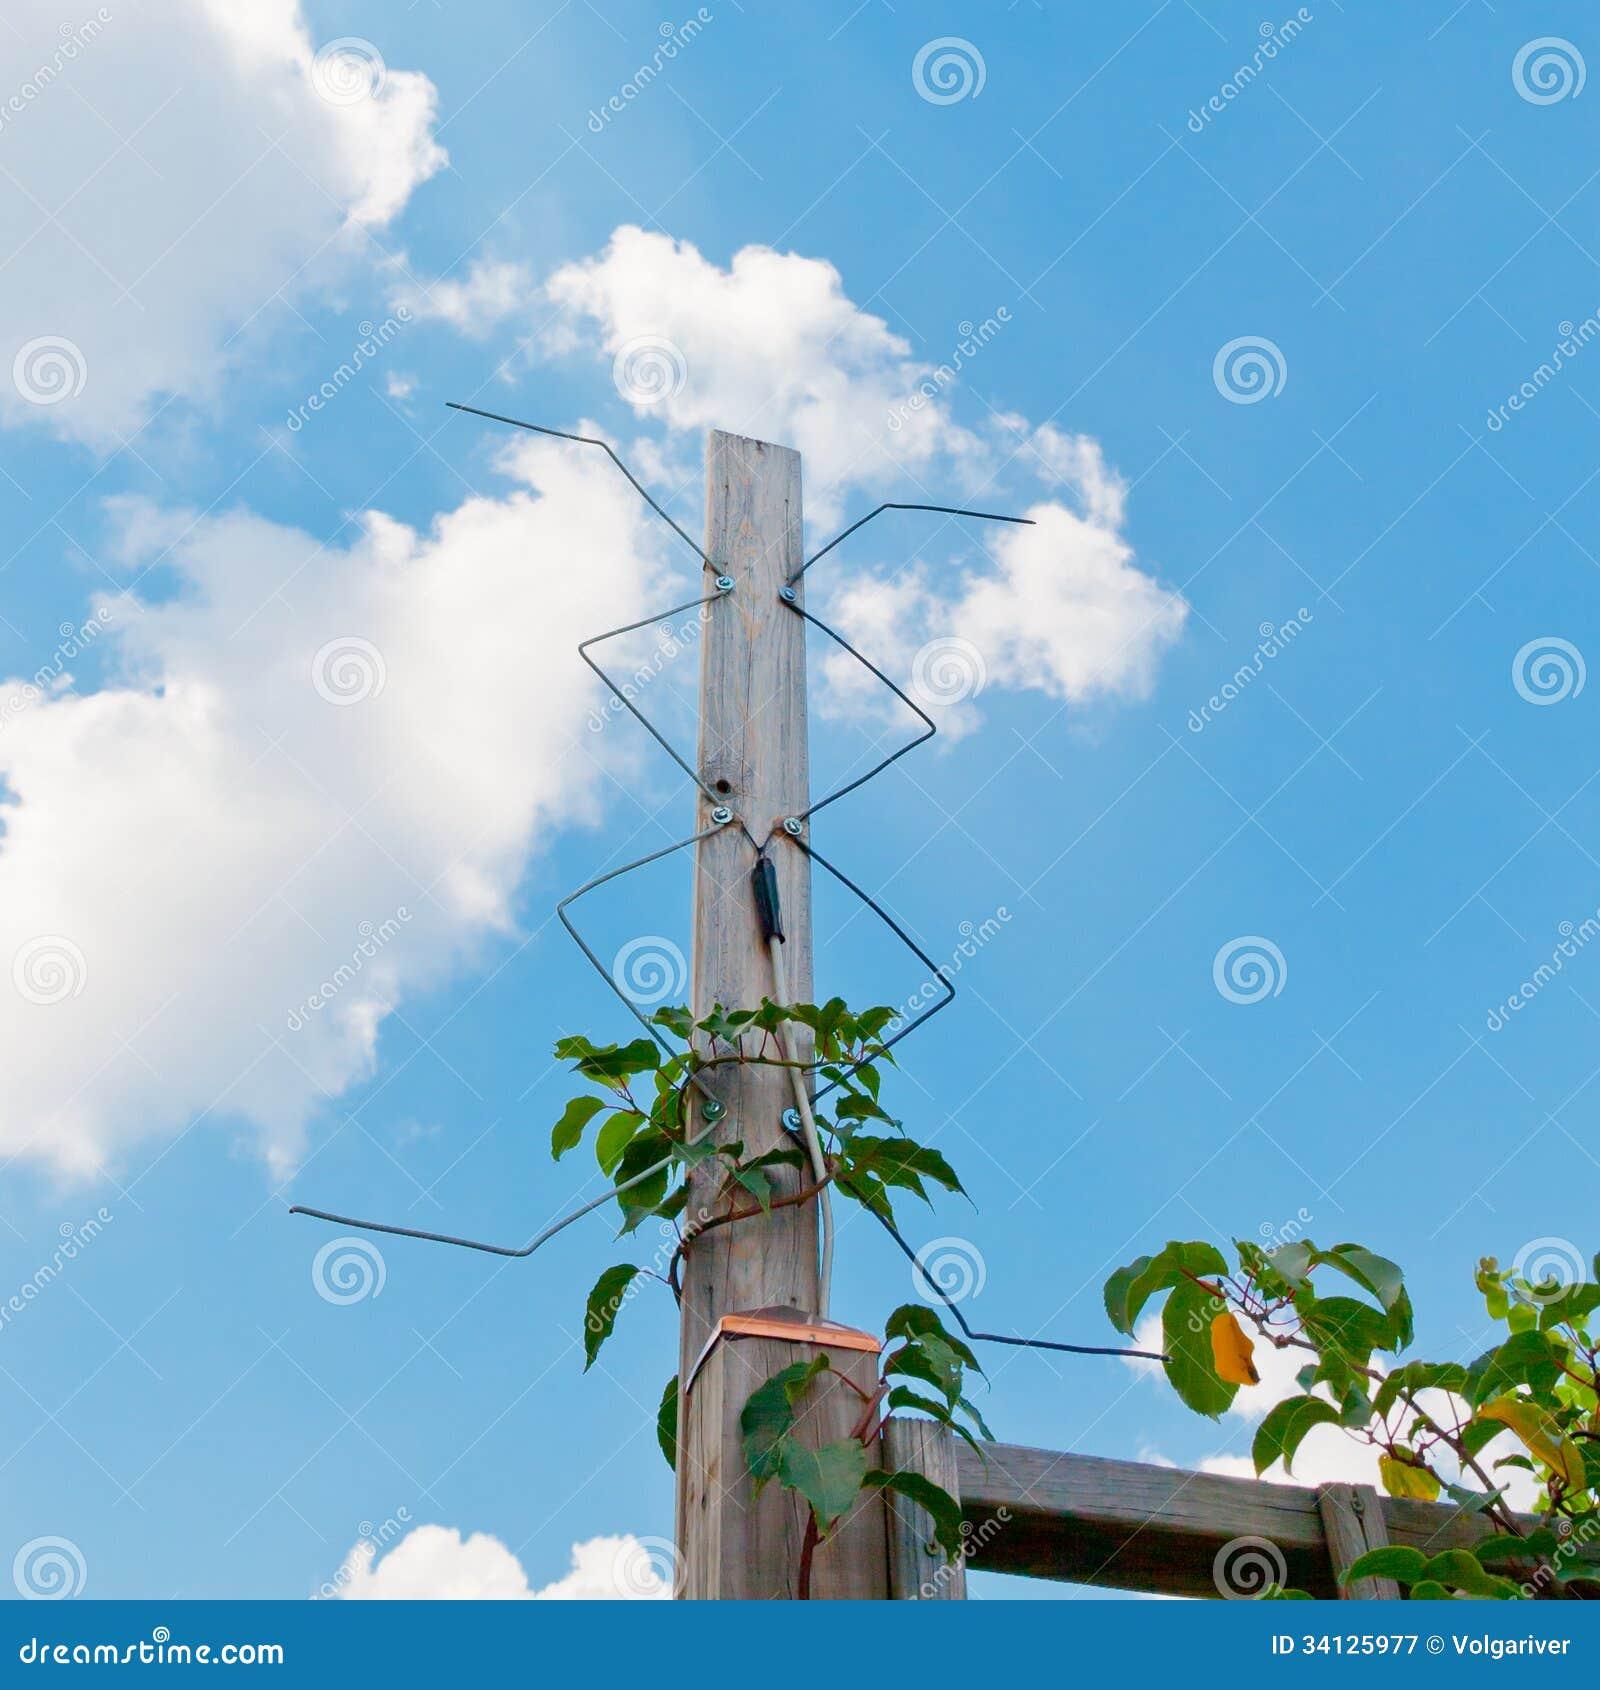 Homemade Digital Outdoor TV Antenna. Royalty Free Stock Photography